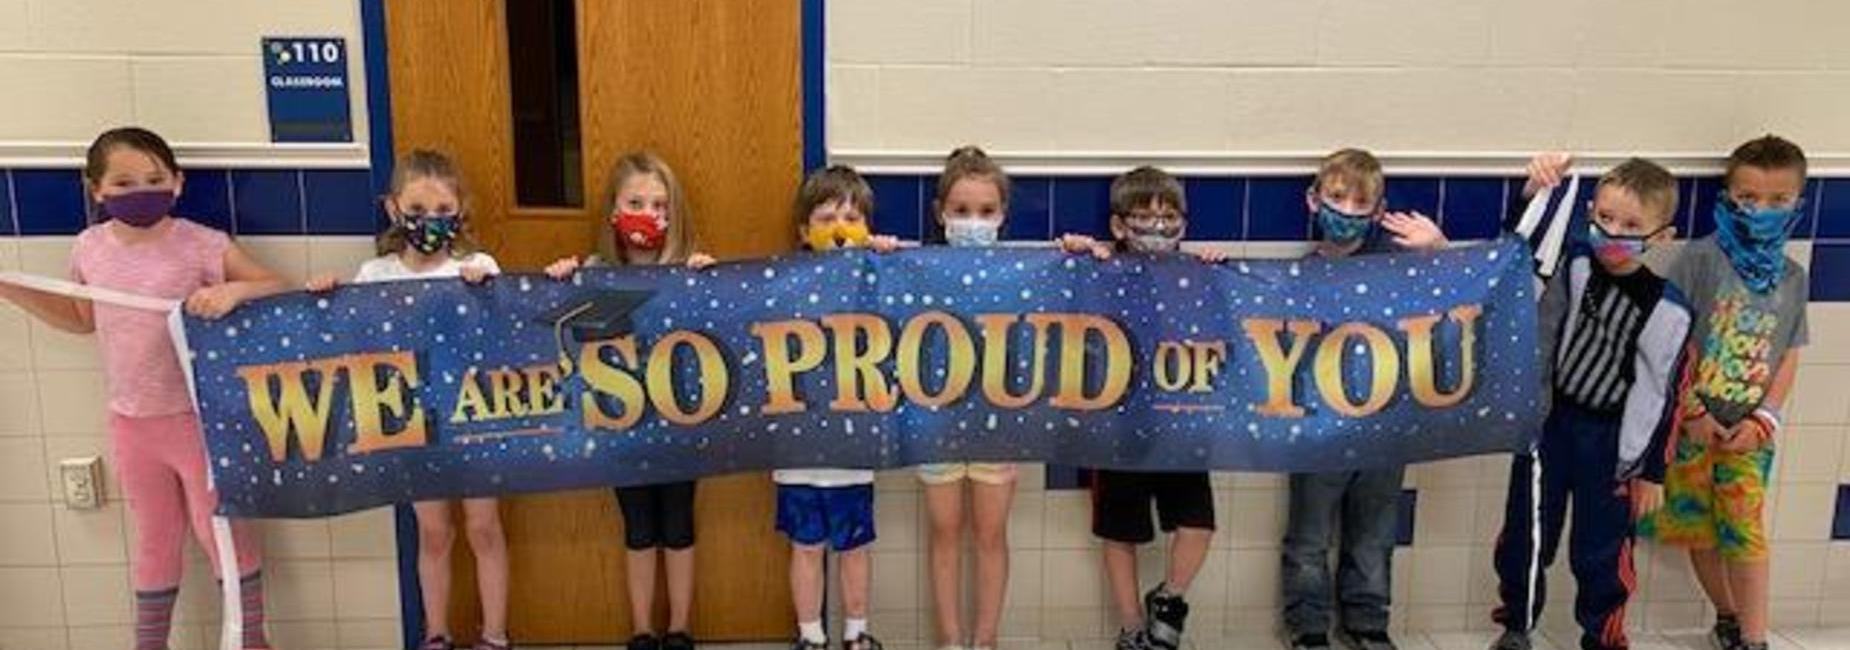 Kids holding up banner